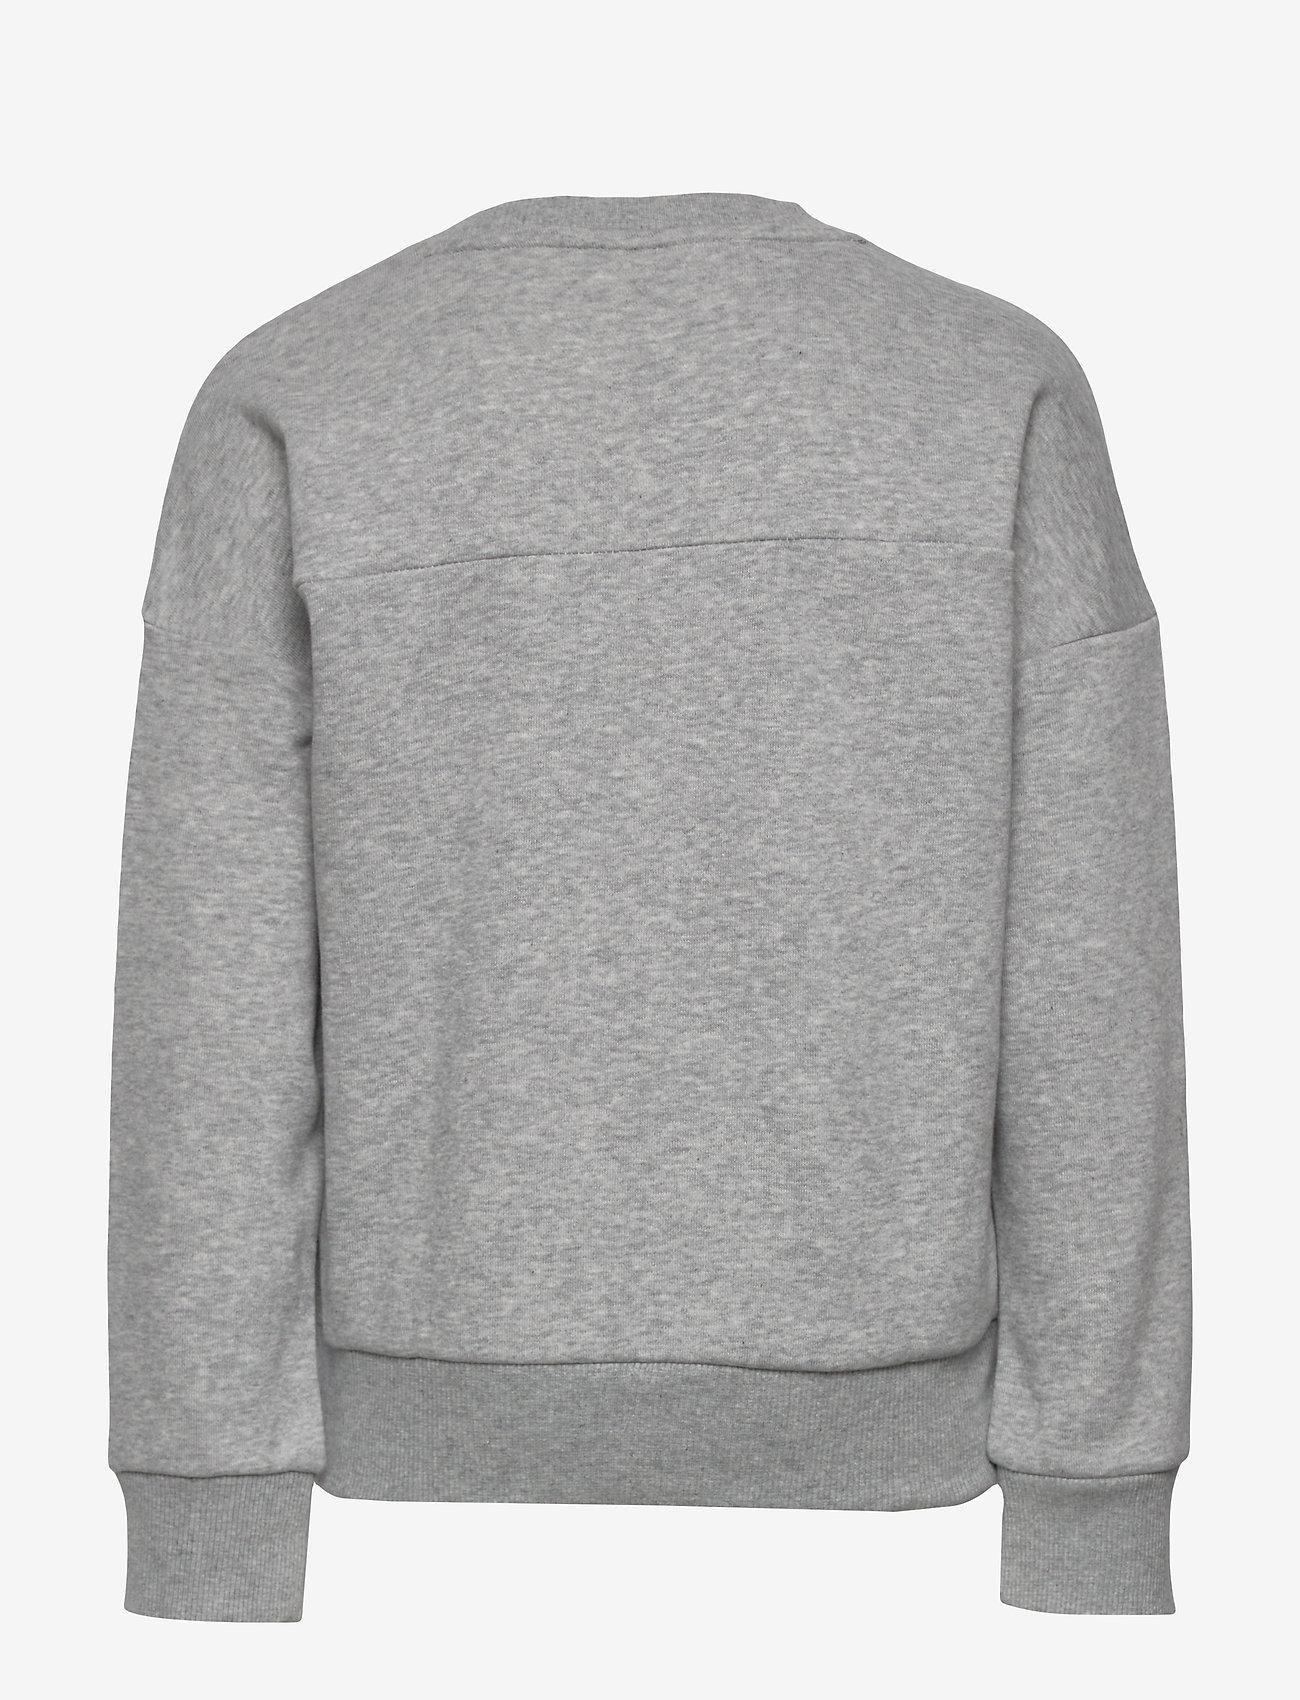 adidas Performance - JG MH CREW - sweatshirts - mgreyh/hazcor - 1